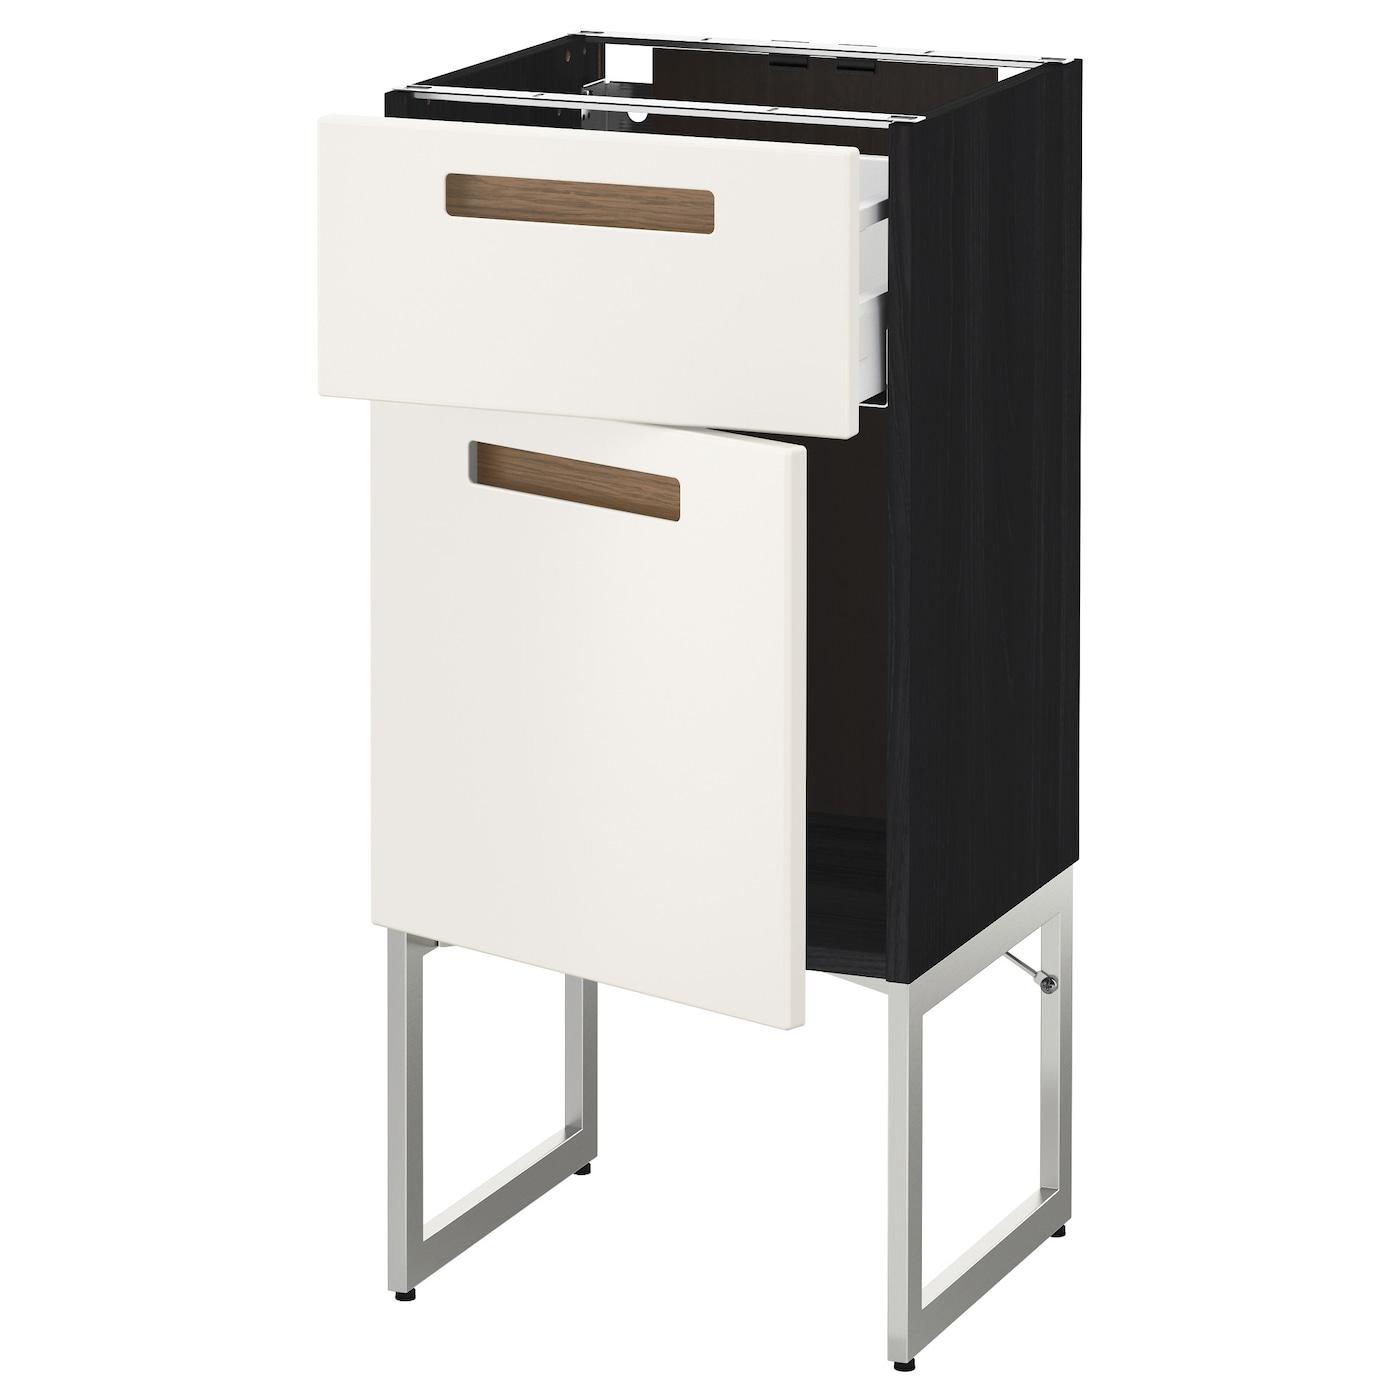 Metod maximera base cabinet with drawer door black m rsta for Black kitchen base cabinets